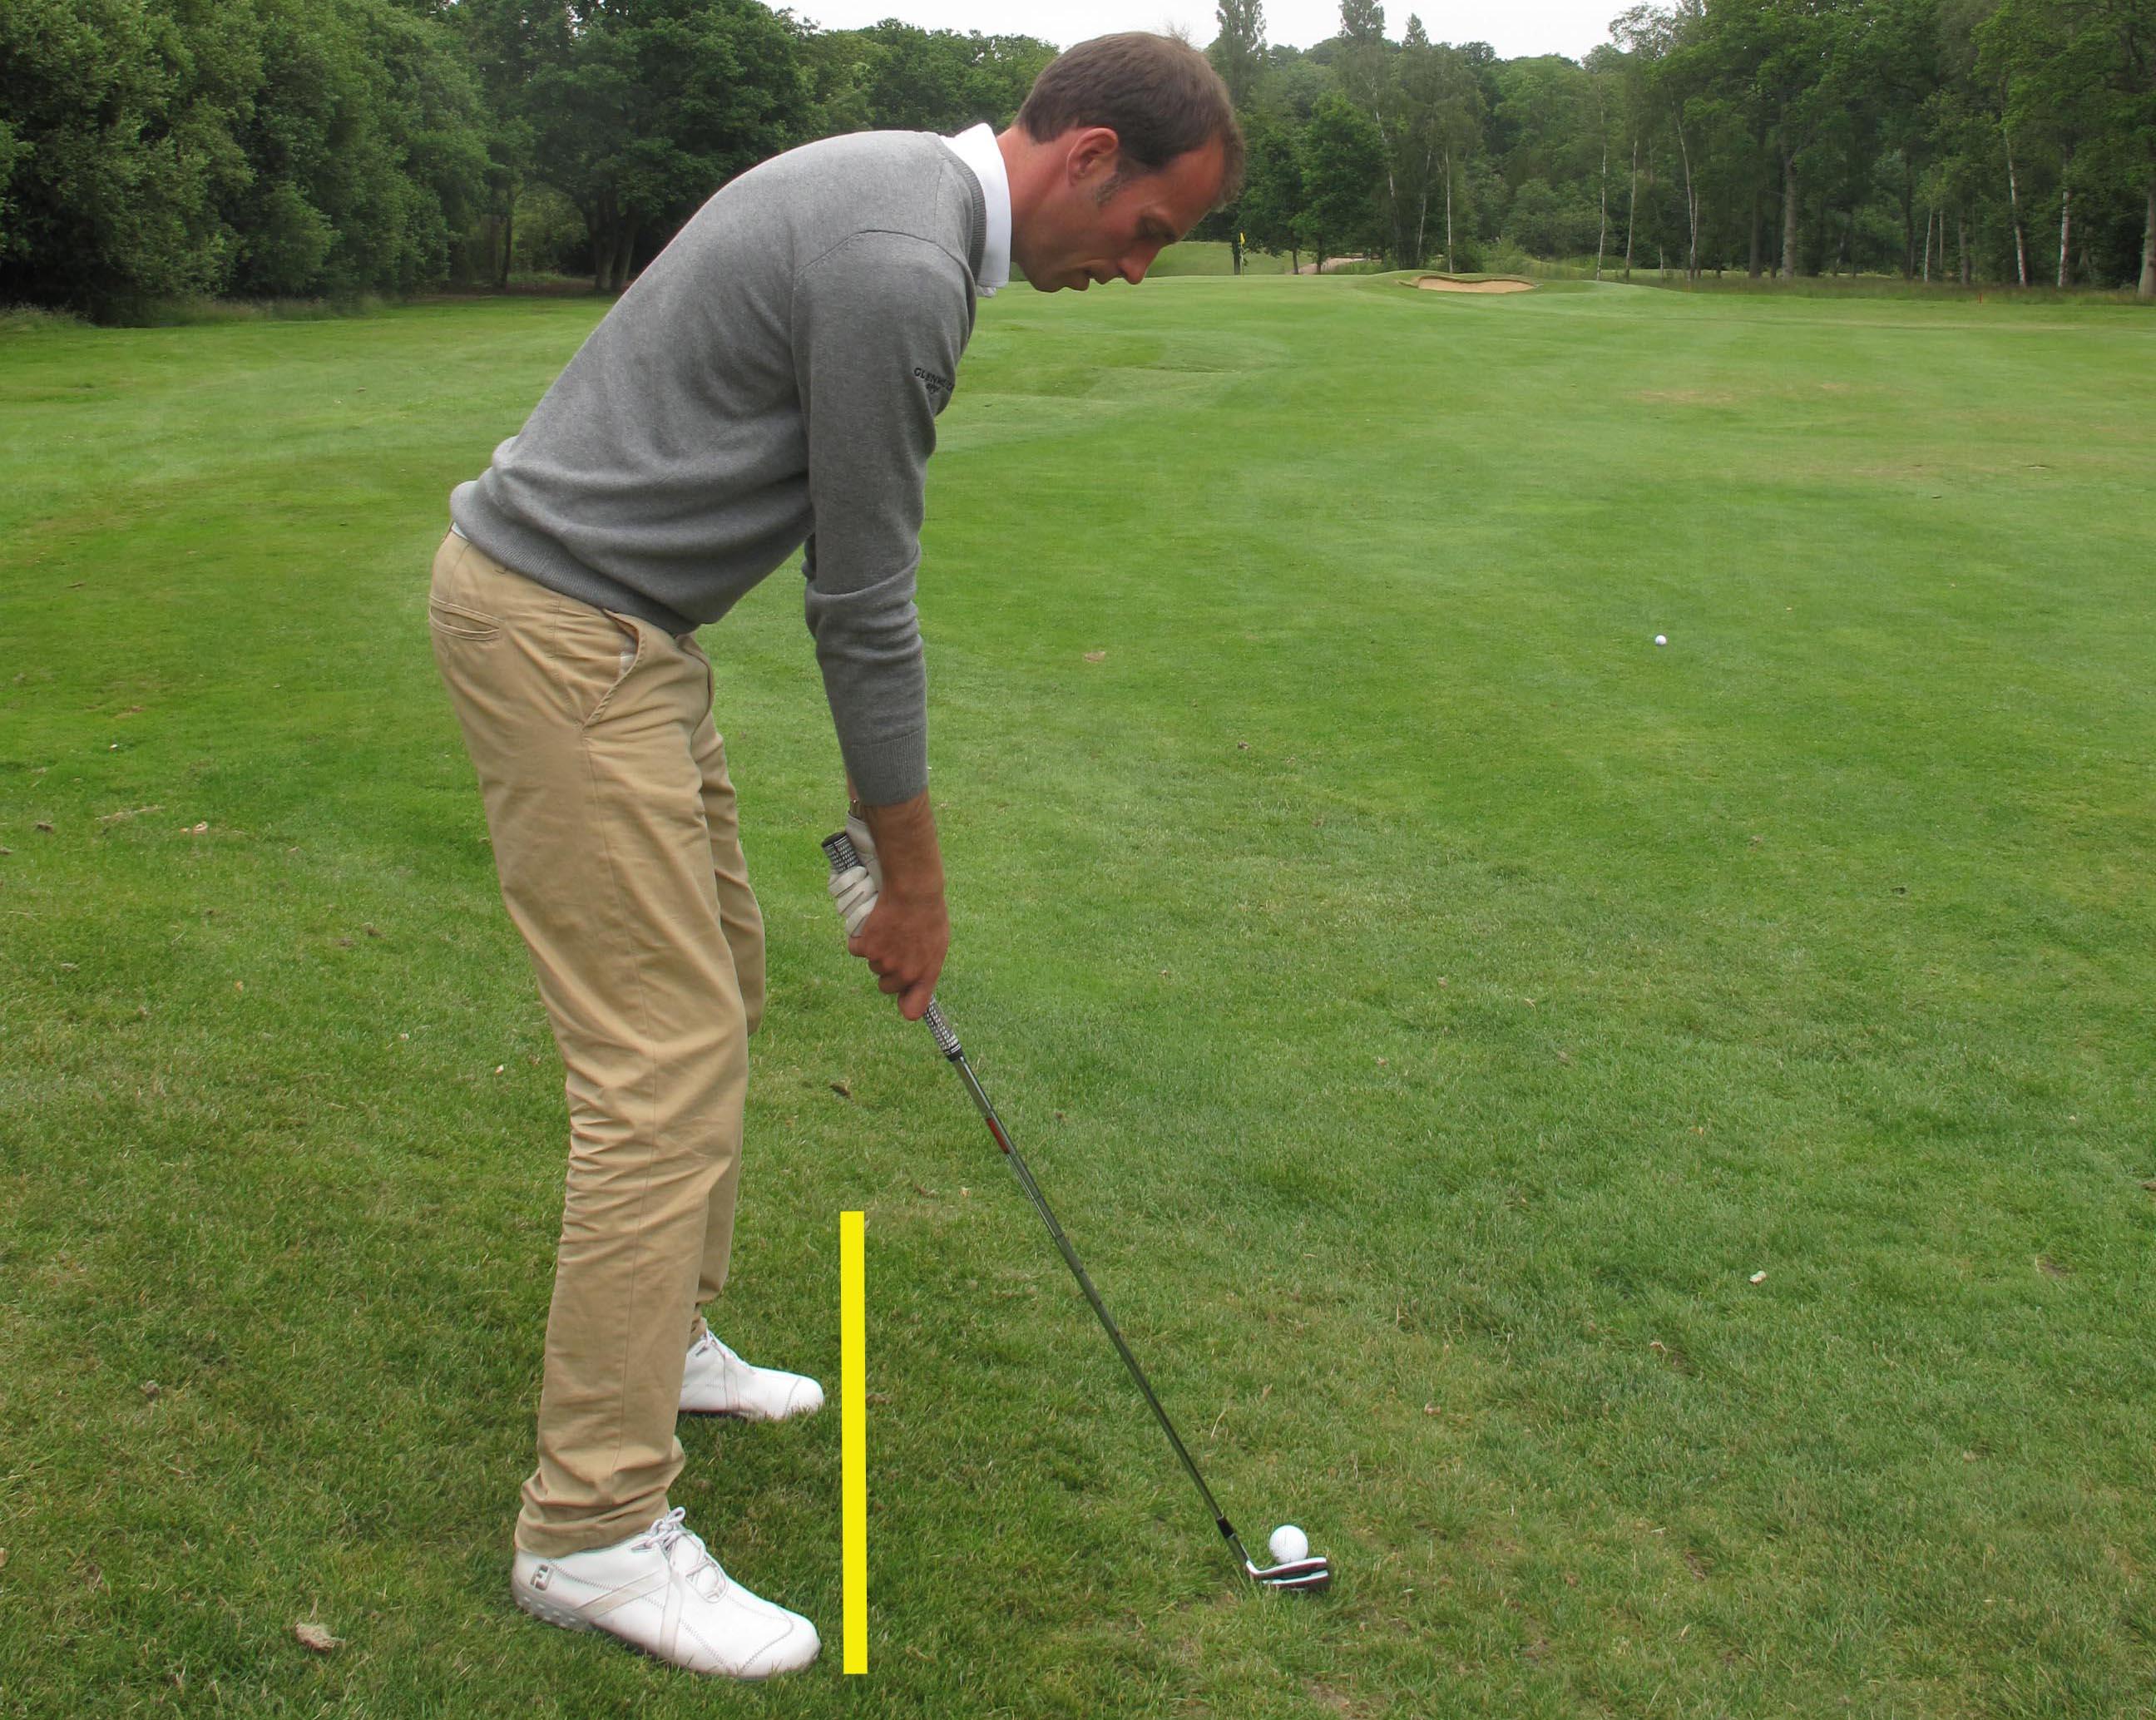 It always seems like a tricky shot but PGA coach Sam Quirke lets us in on a few simple secrets